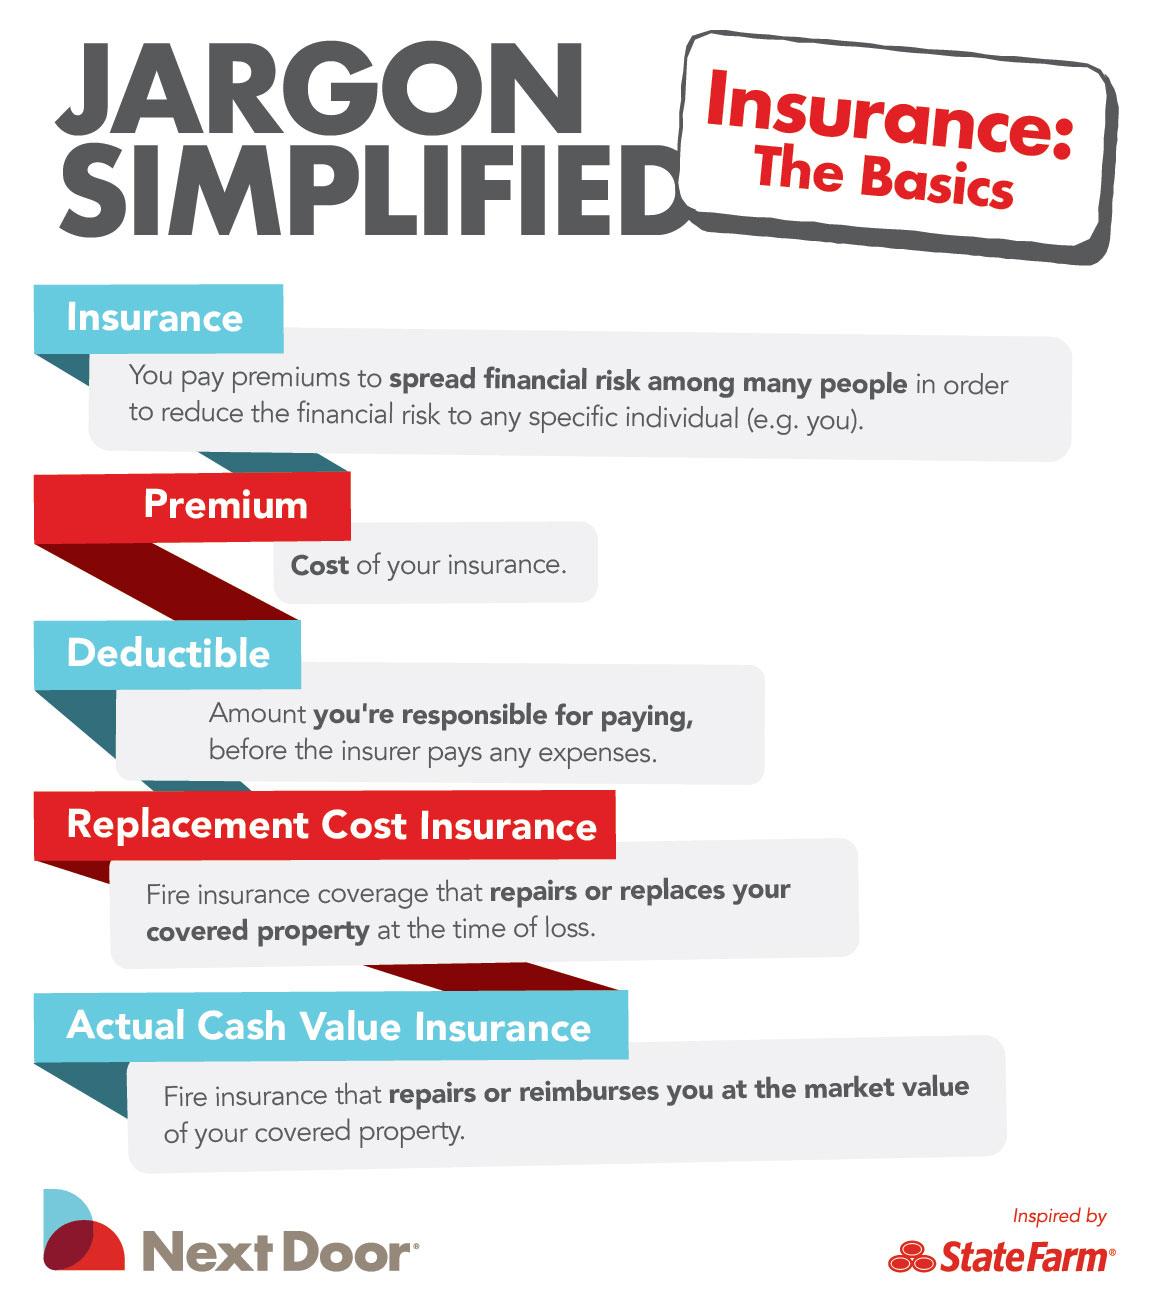 Insurance Basics Infographic